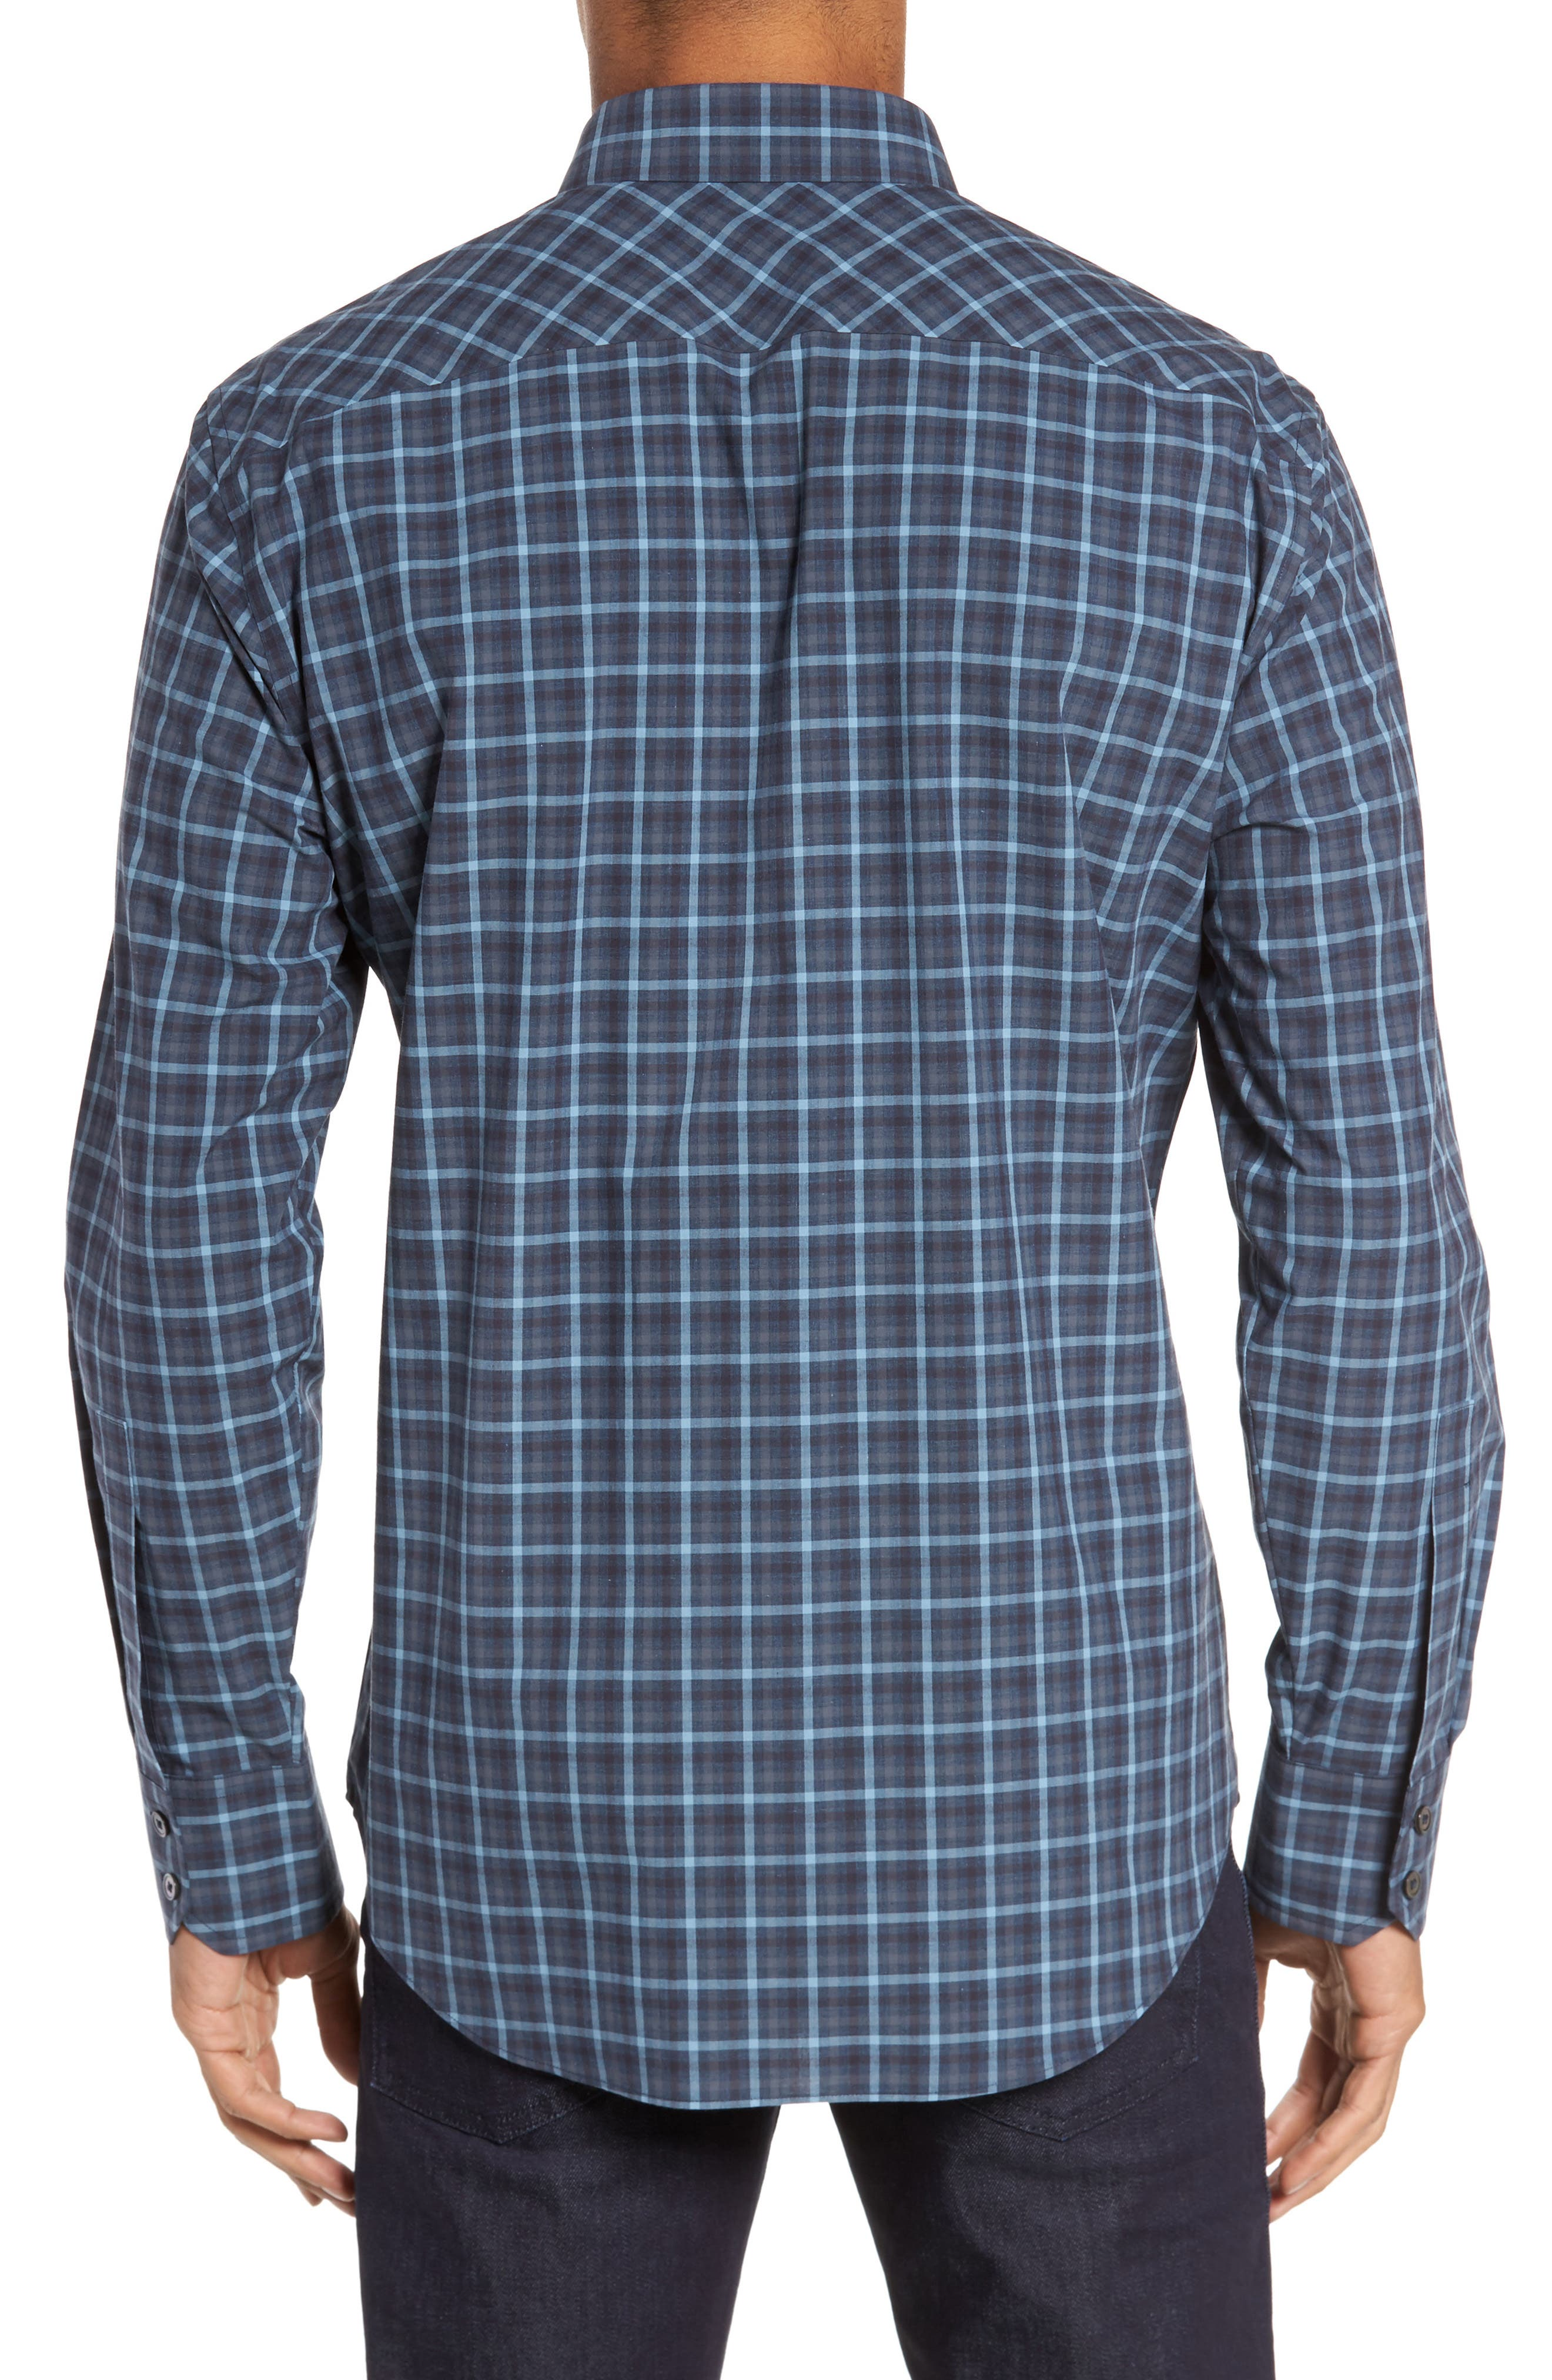 Lozado Check Sport Shirt,                             Alternate thumbnail 2, color,                             400